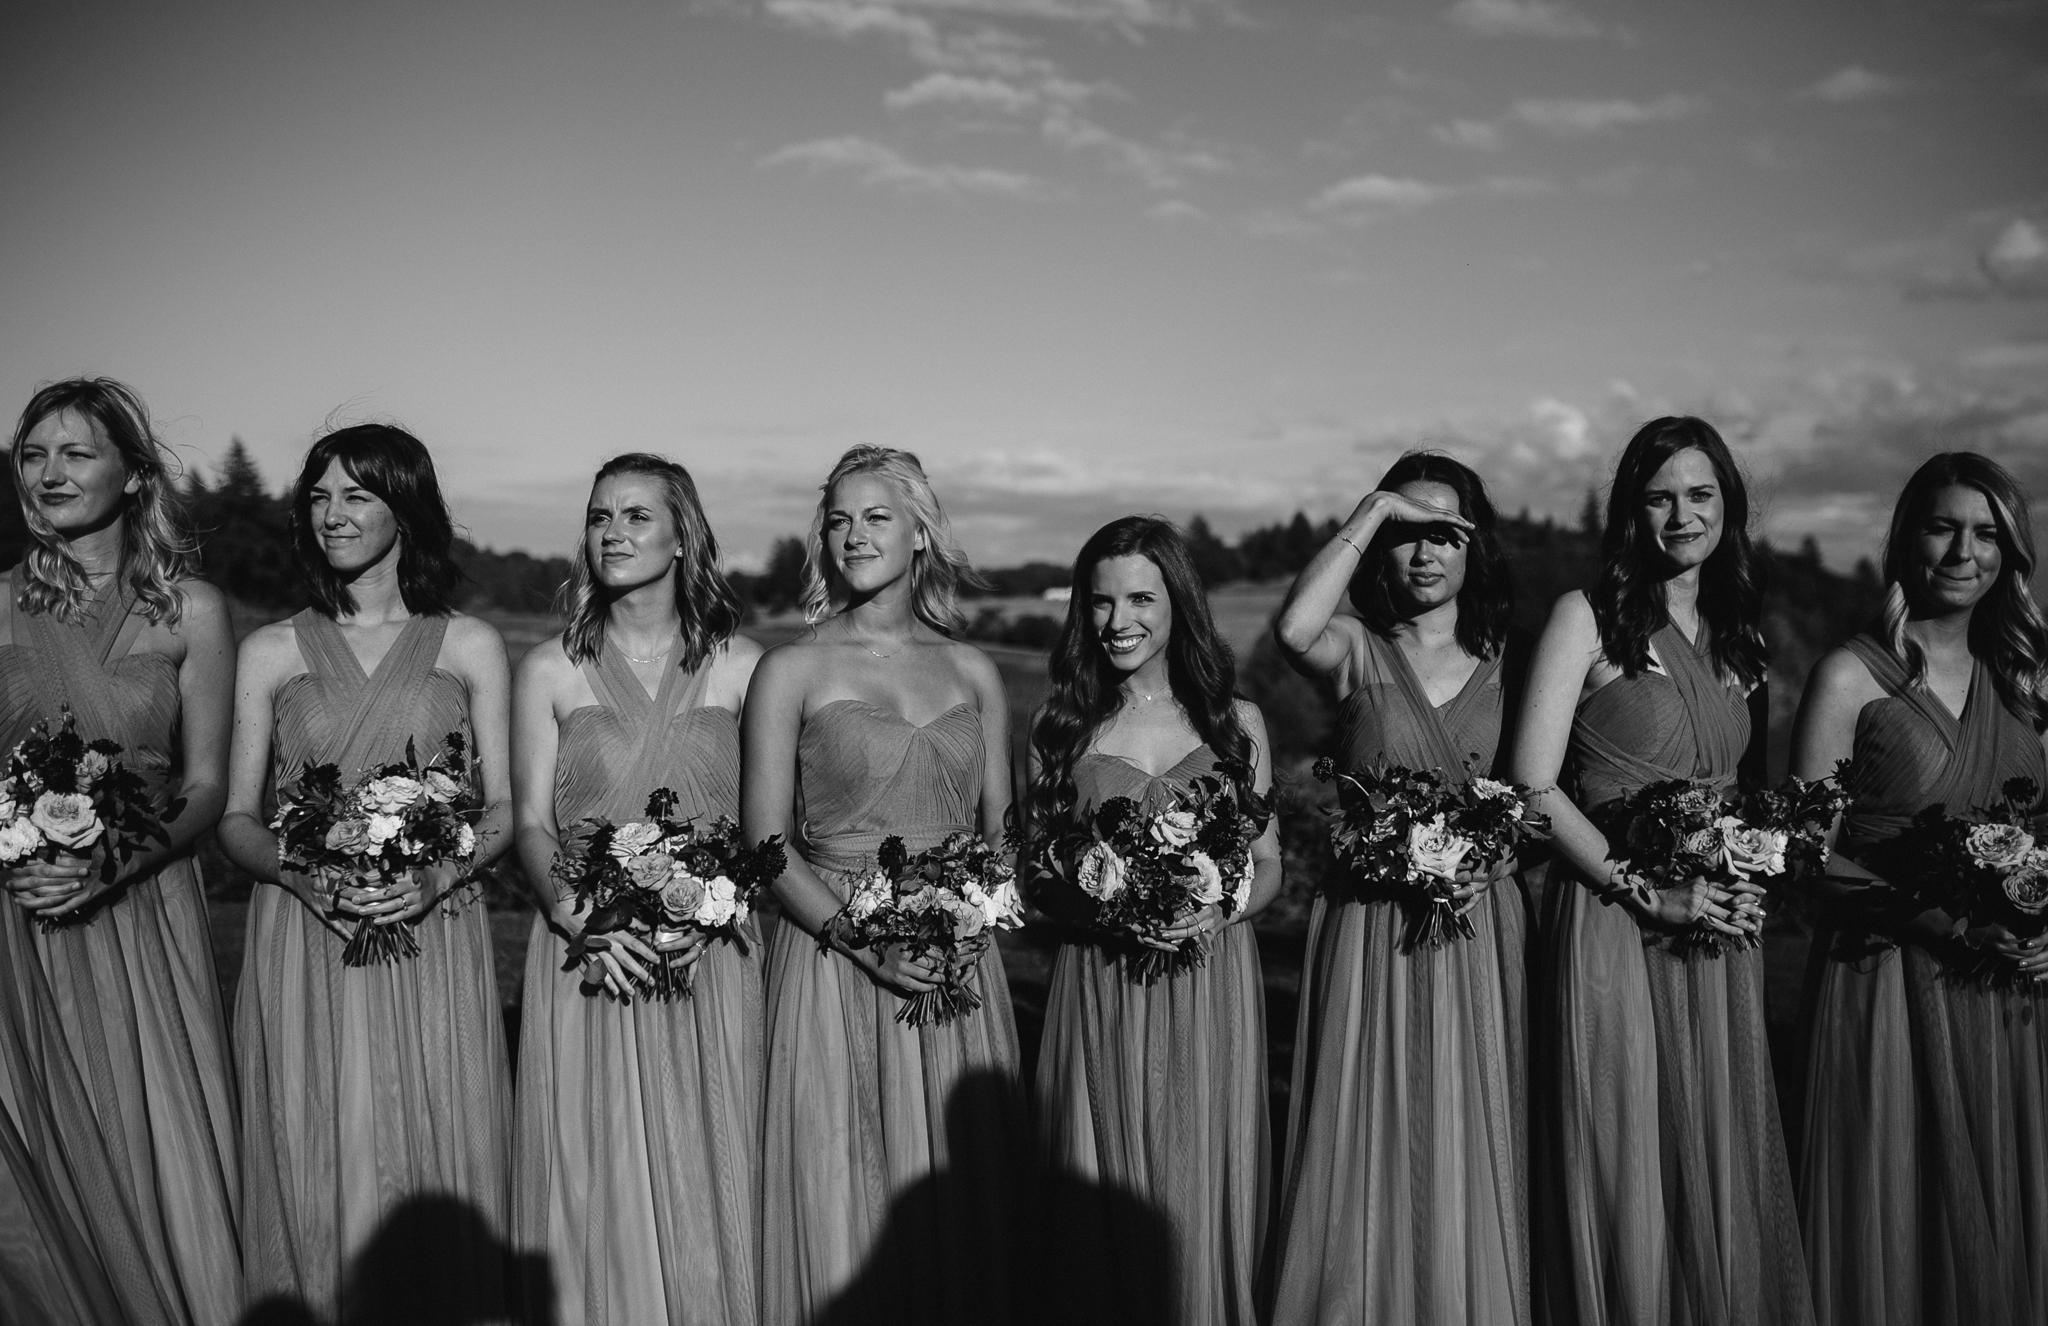 zenith-vineyard-oregon-summer-wedding-654.jpg